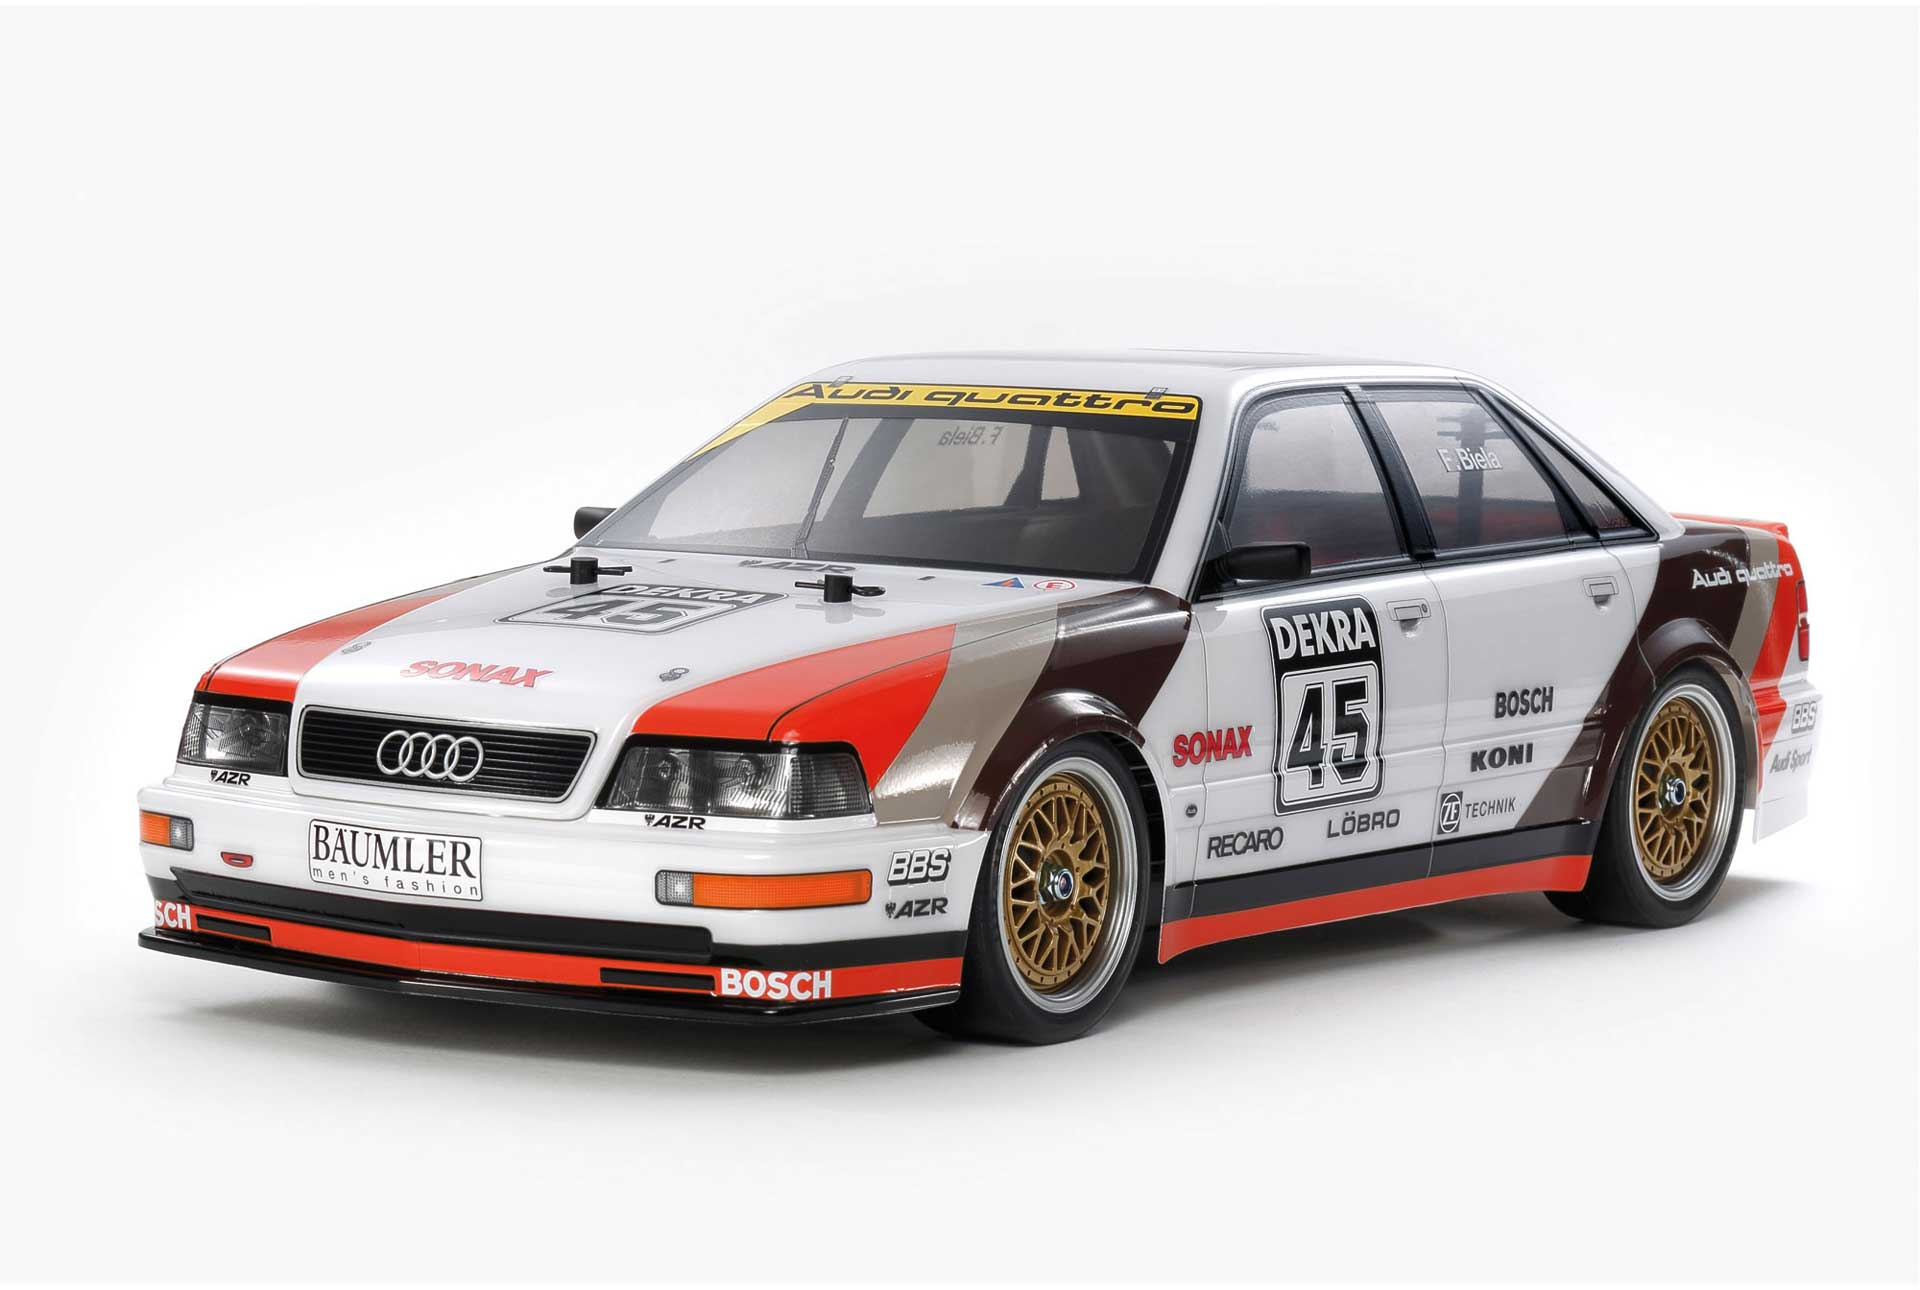 TAMIYA Audi V8 1991 Touring Car (TT-02) 1/10 KIT 4WD No.45 von 1991 Frank Biela